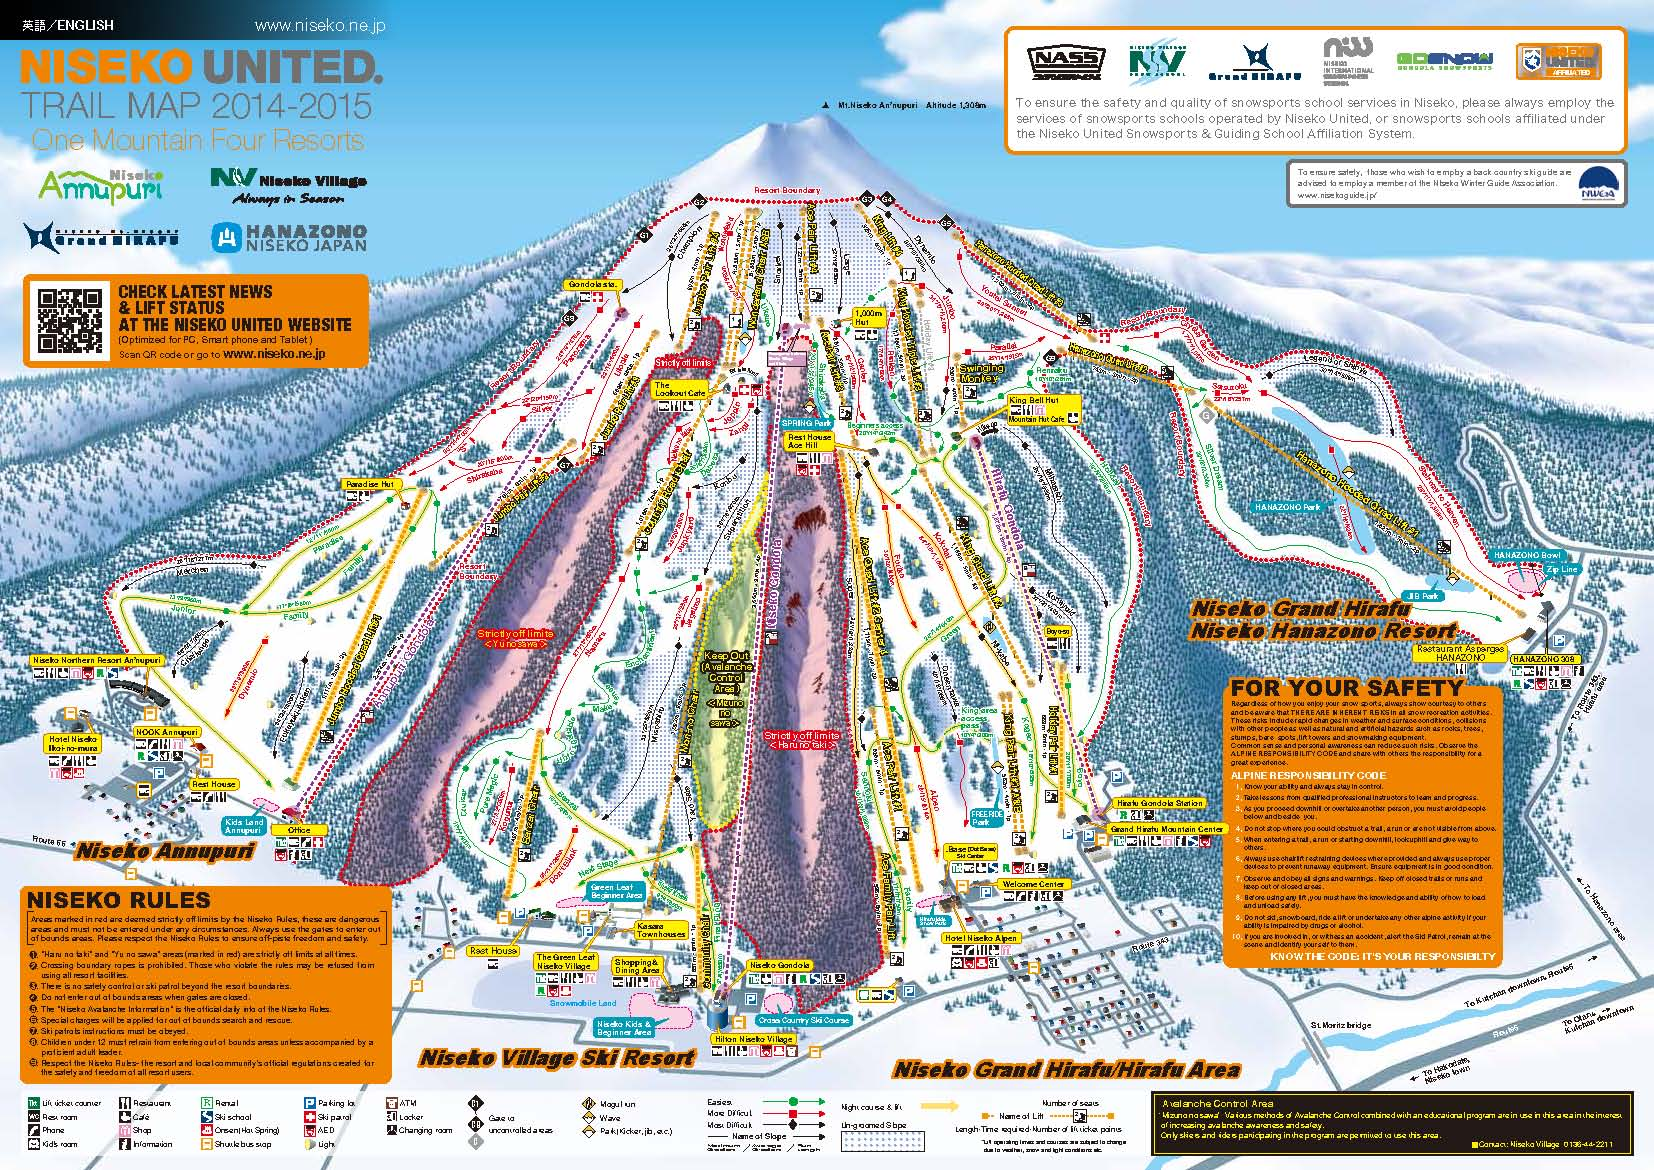 Niseko Ski Resort Hotels